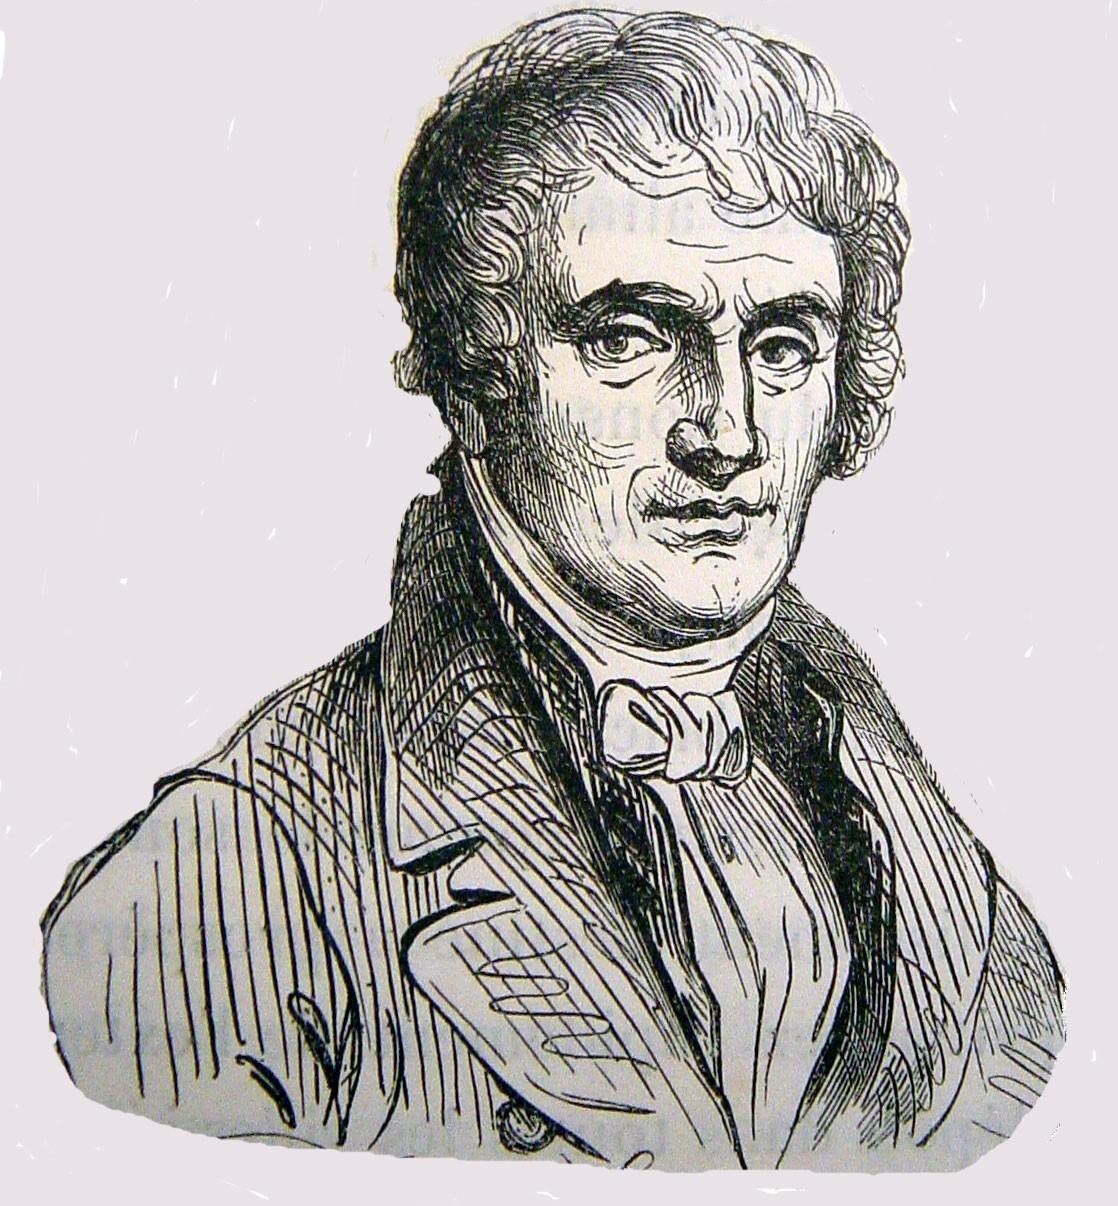 Sulpice Debauve 1757 - 1836